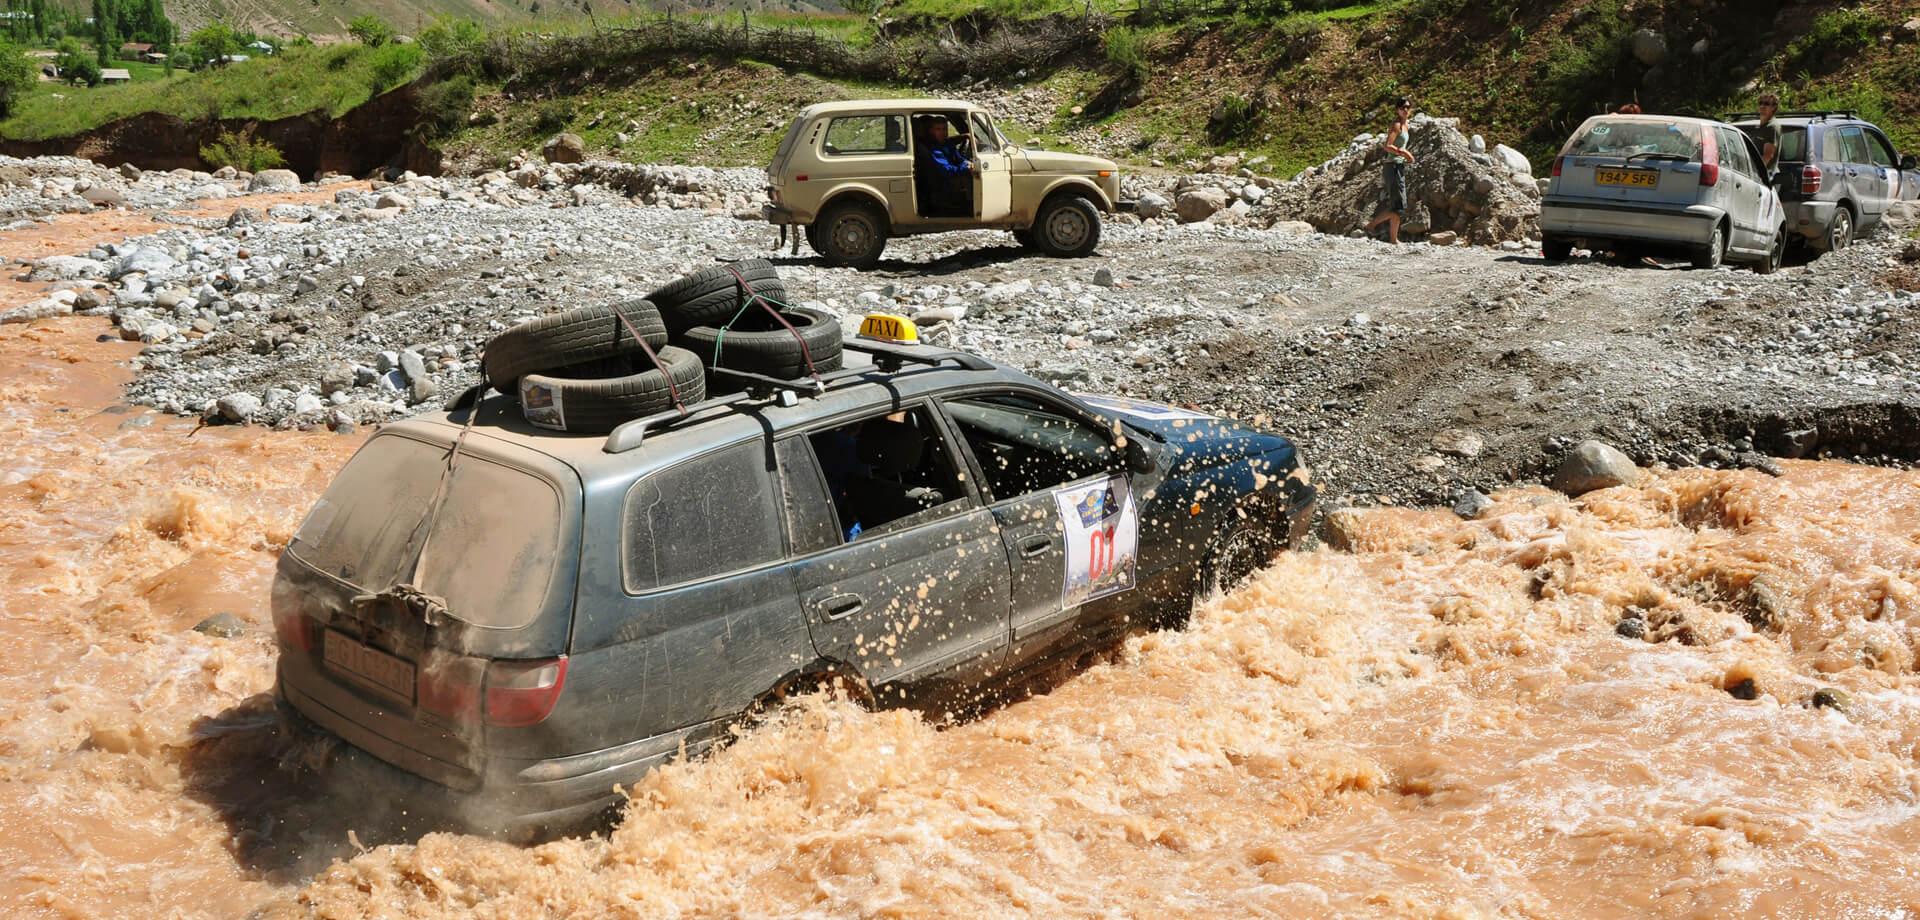 Banger Rally Adventure River crossing in Tajikistan with VW Passat